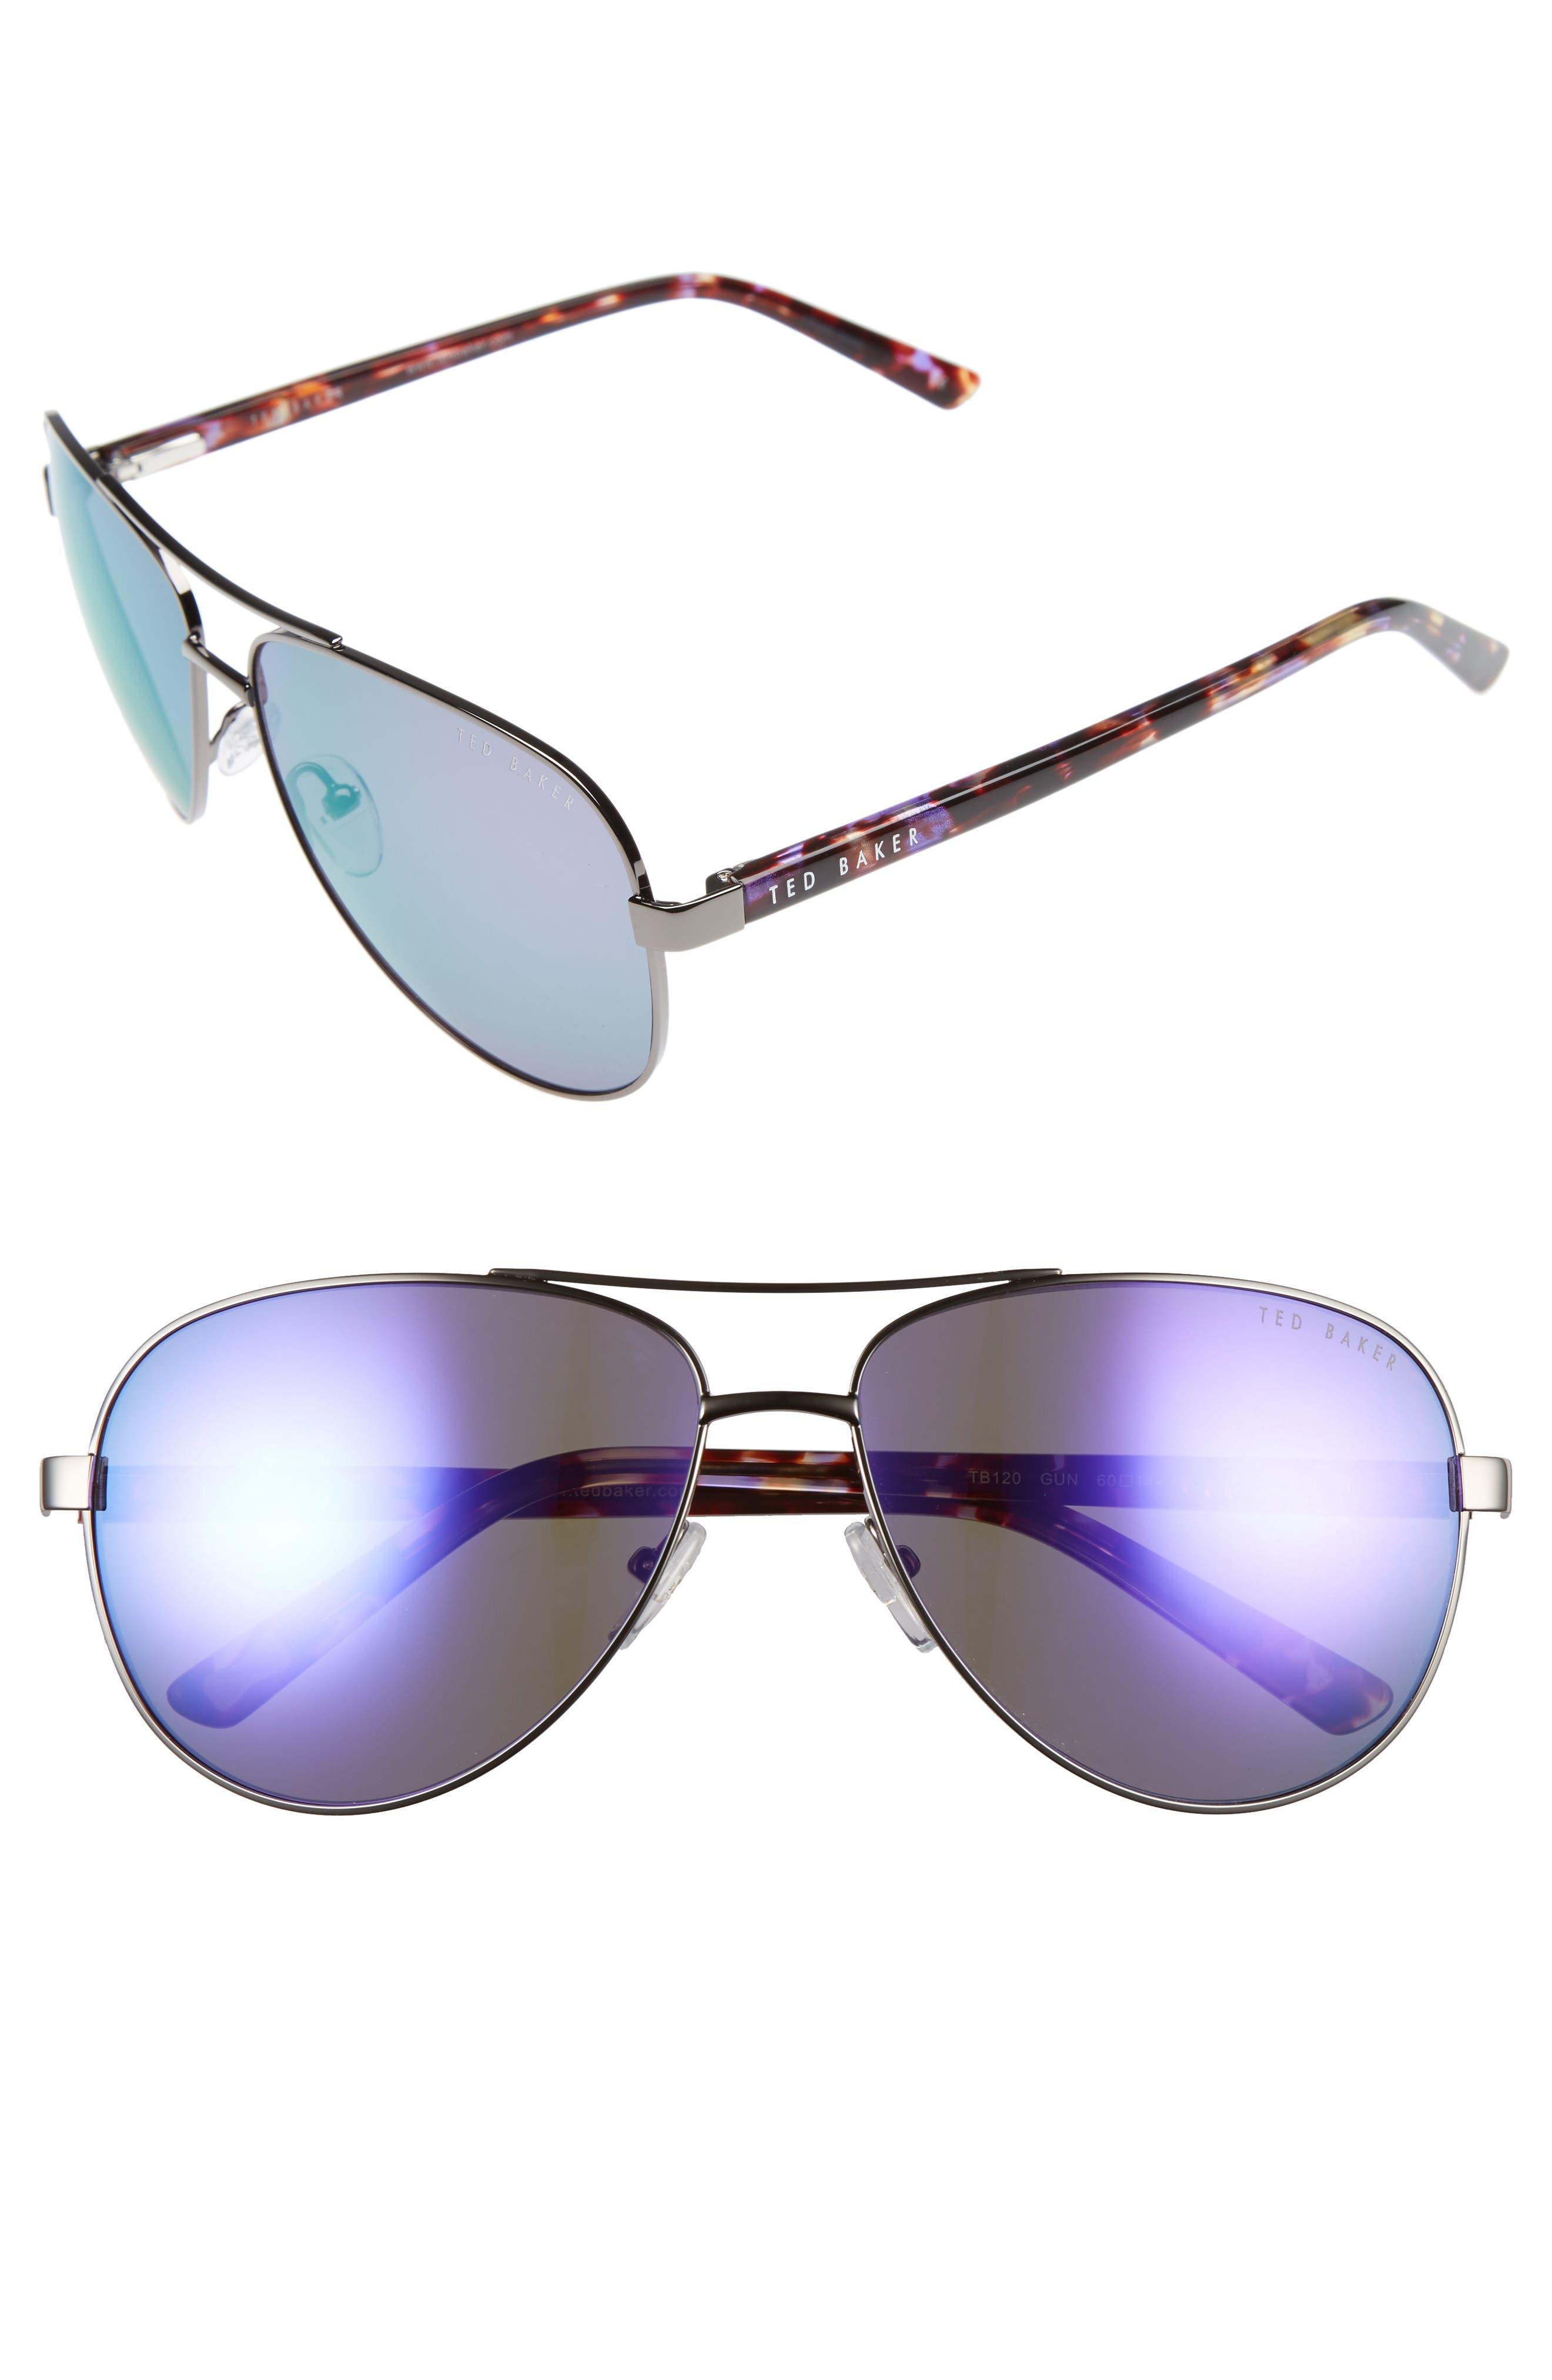 60mm Aviator Sunglasses,                             Main thumbnail 1, color,                             GUNMETAL